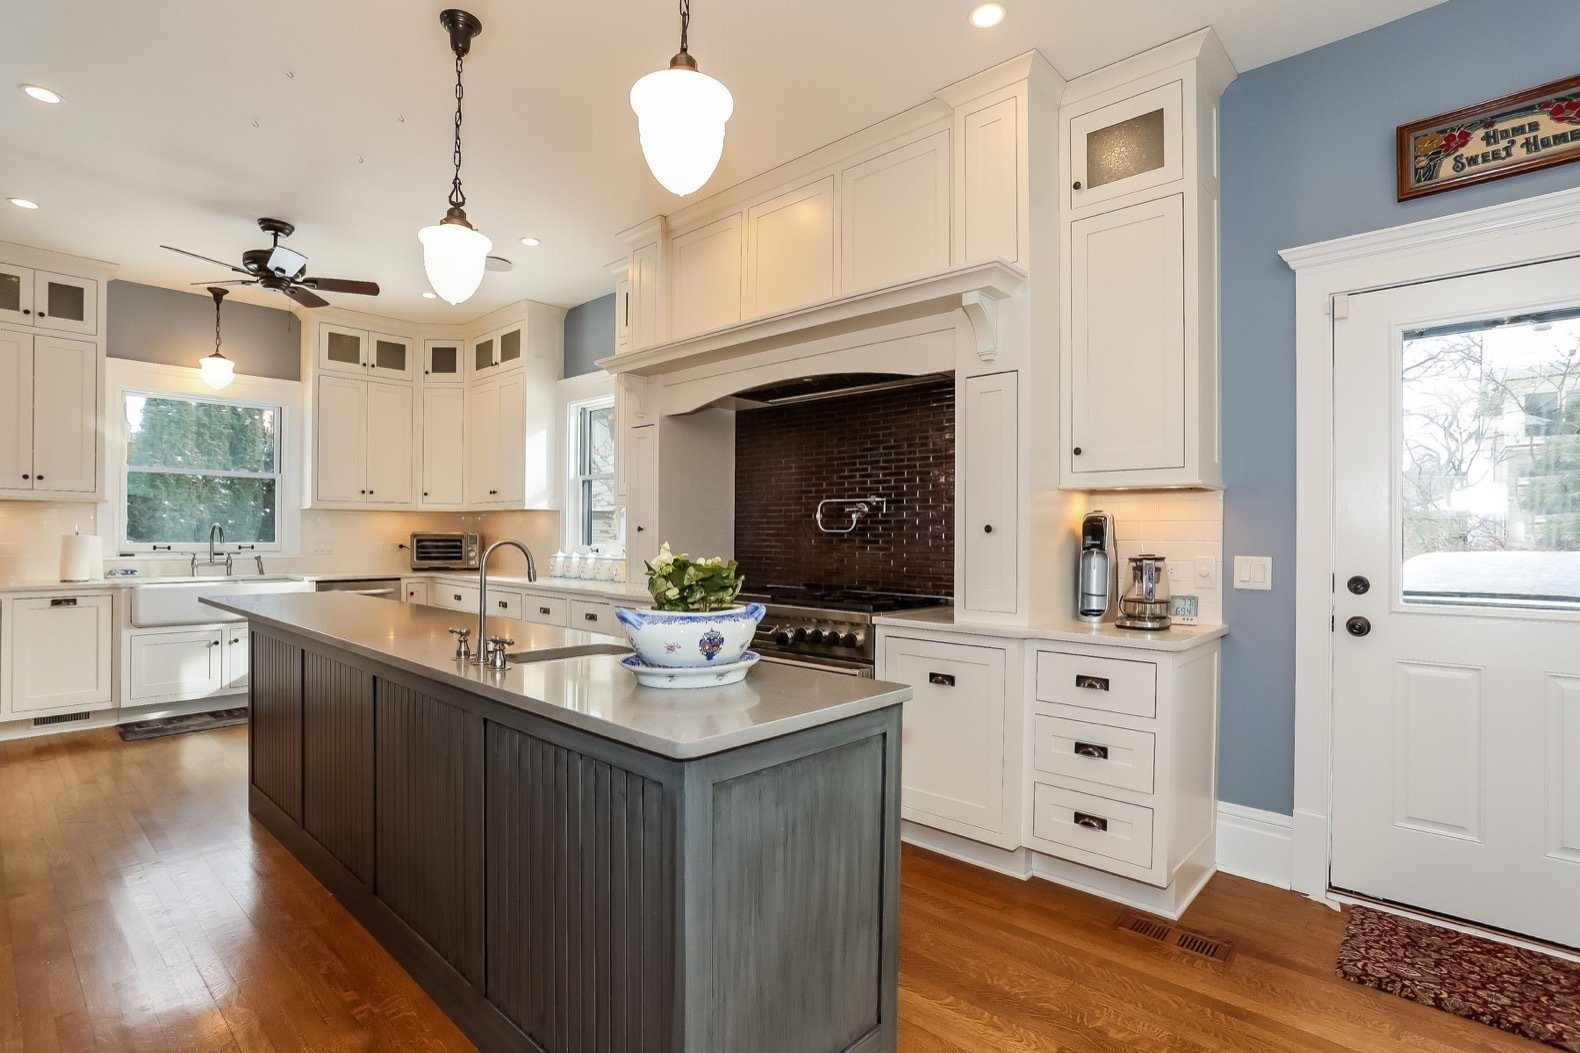 W. Irving Clark House kitchen